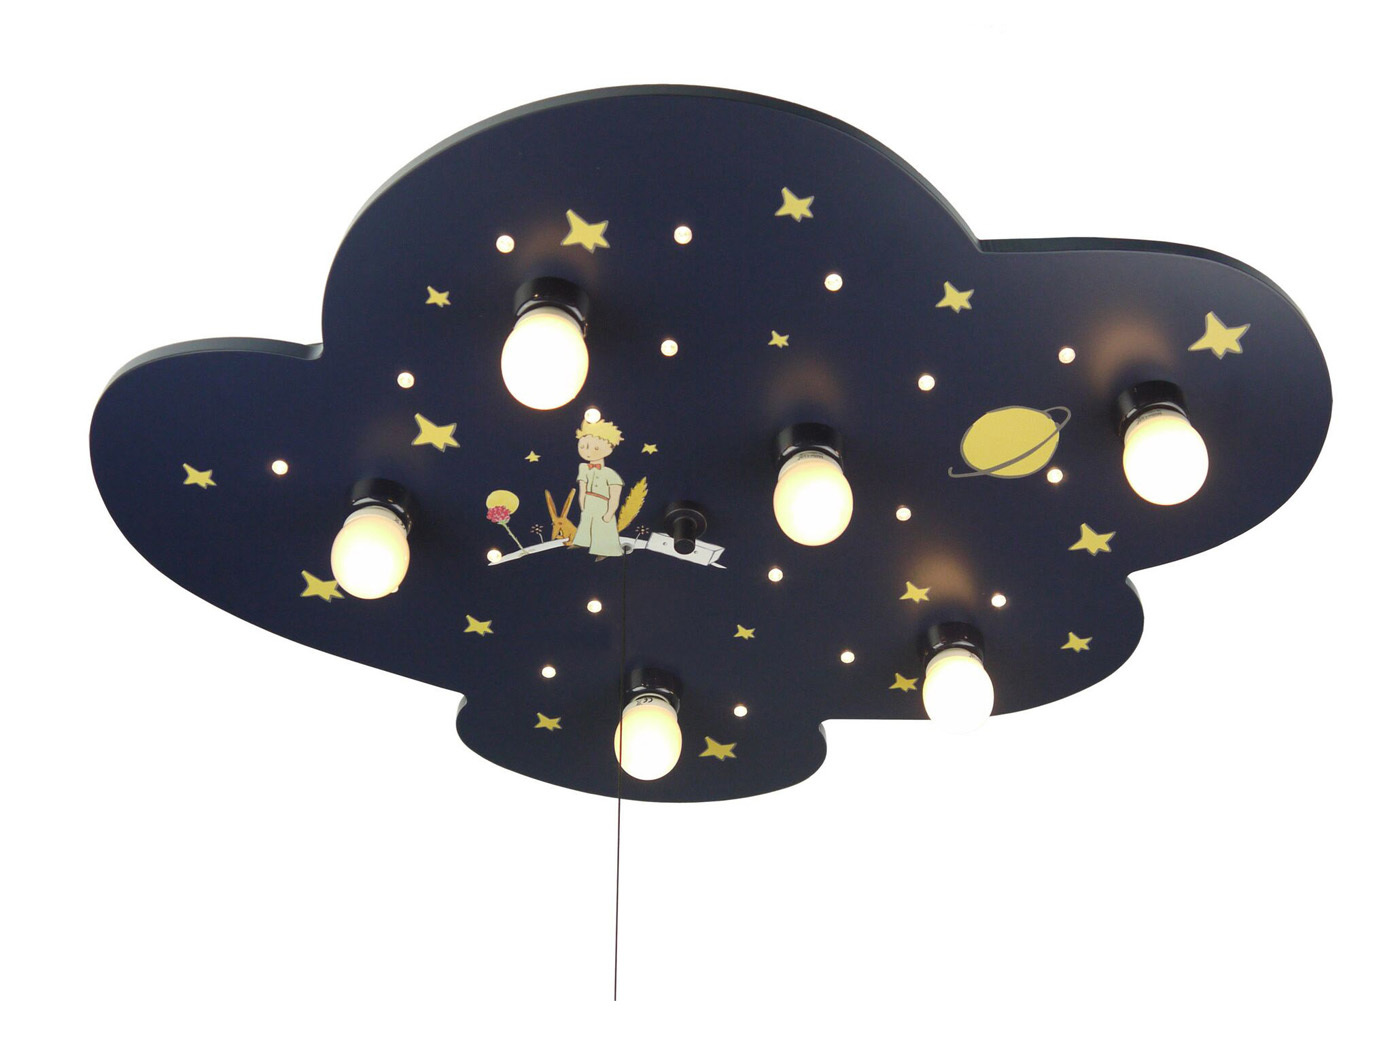 xxl deckenlampe f r kinderzimmer alexa licht an led. Black Bedroom Furniture Sets. Home Design Ideas